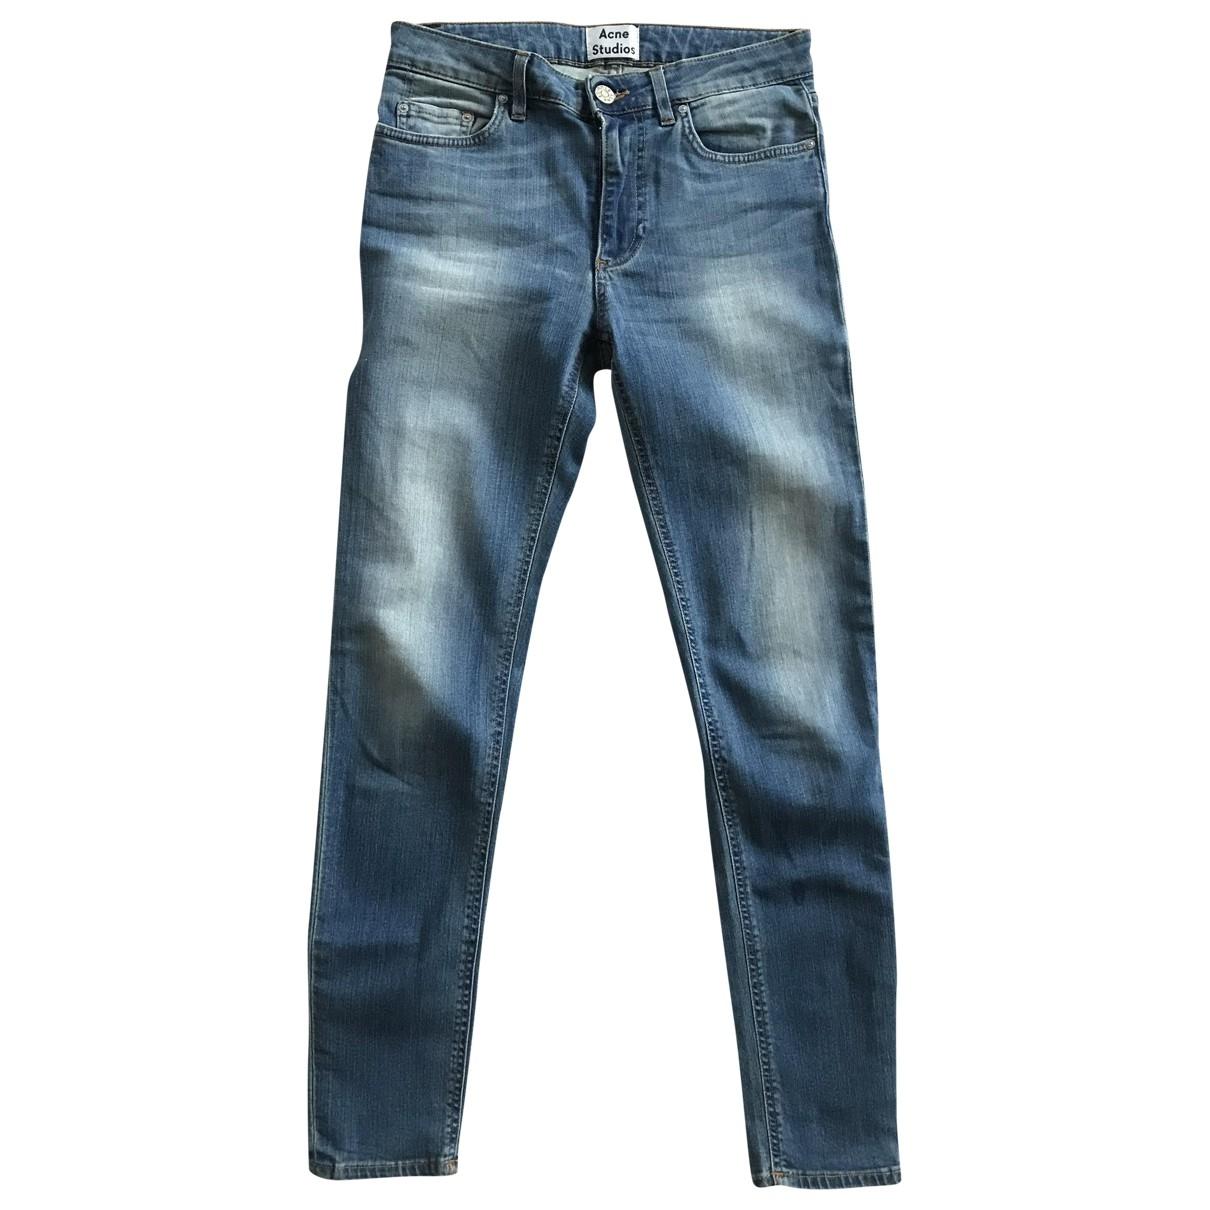 Acne Studios Skin 5 Blue Cotton - elasthane Jeans for Women 26 US